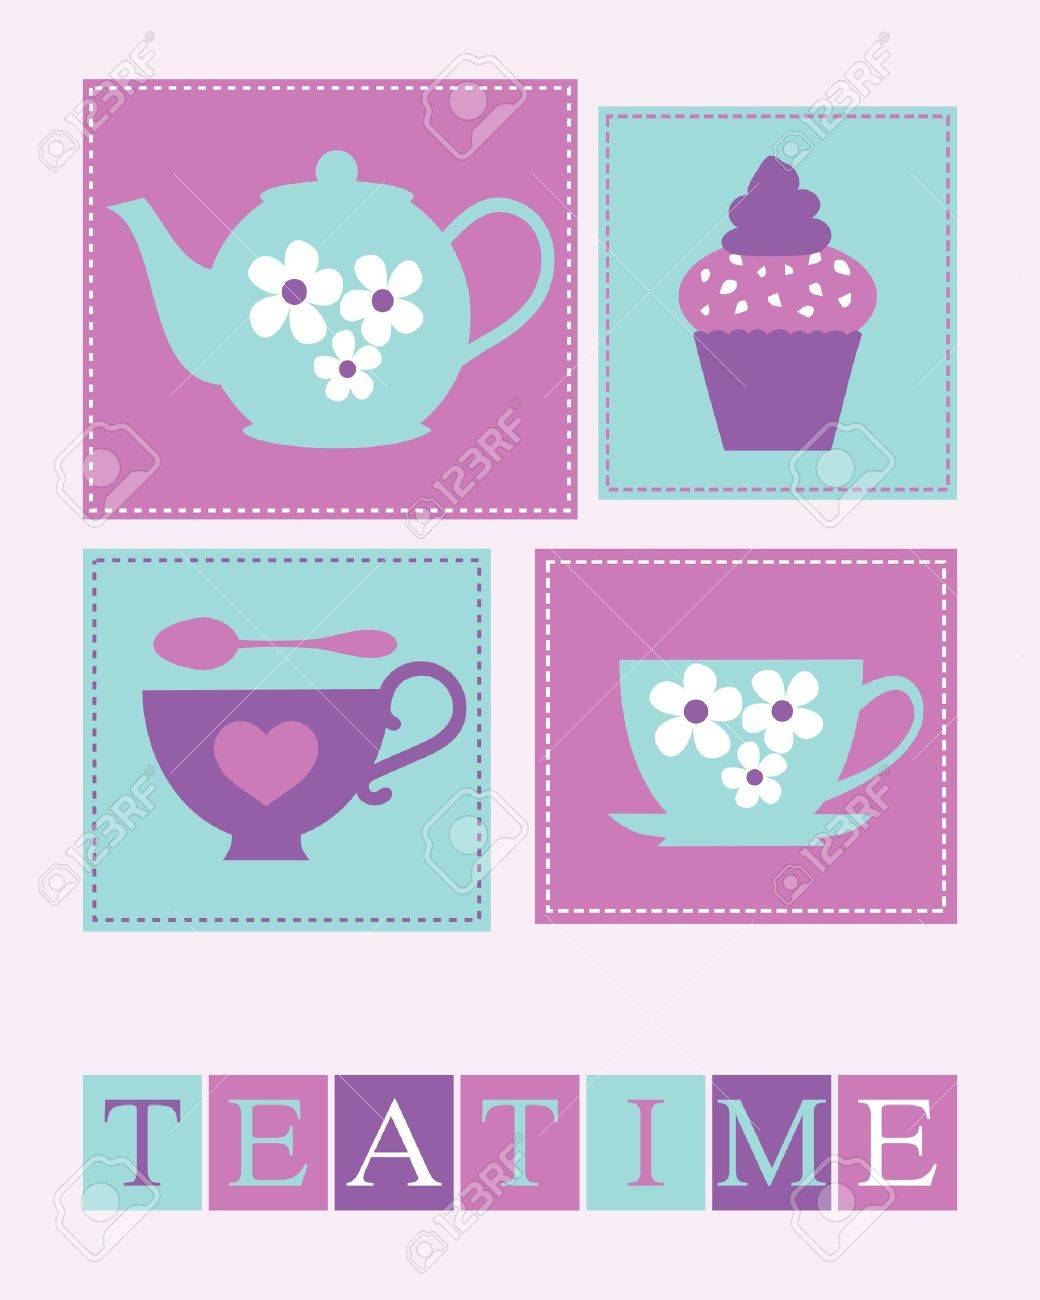 Elegant tea party invitation template with teacups cartoon vector - Teapot Illustration Of Cute Teacups Teapot And A Cupcake